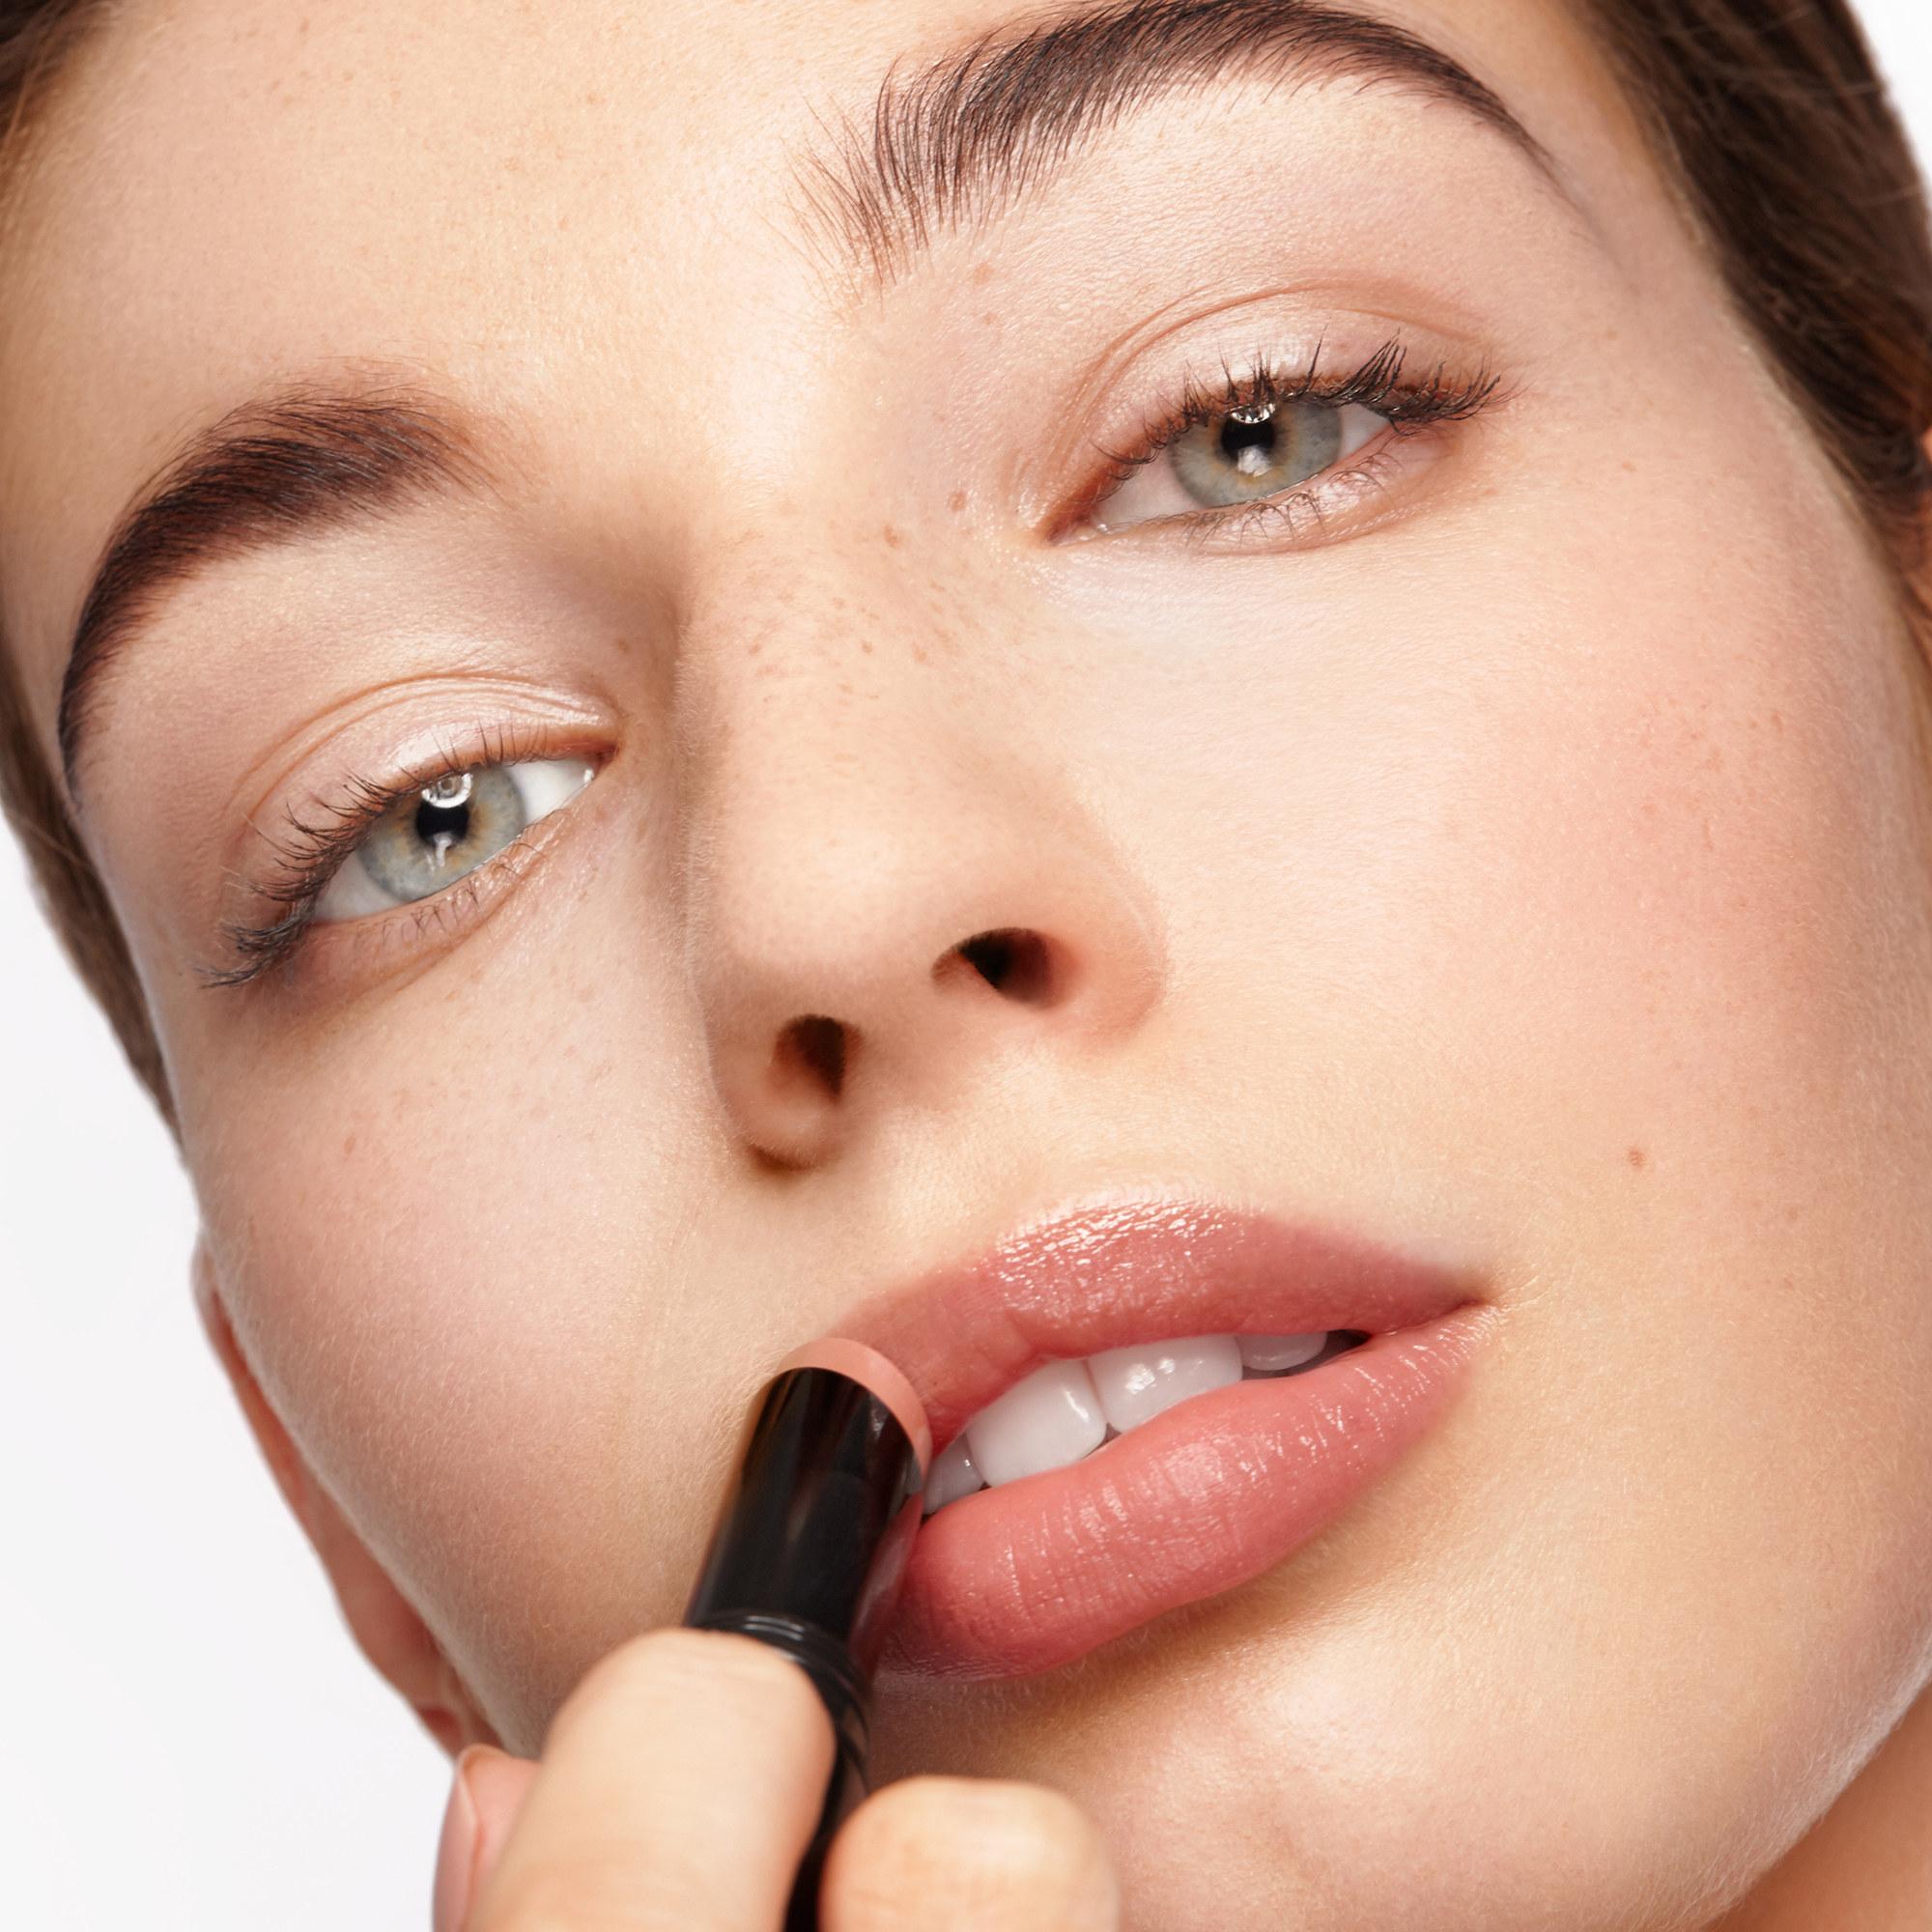 Woman applying Futurelipstick Luxe Shine on lips